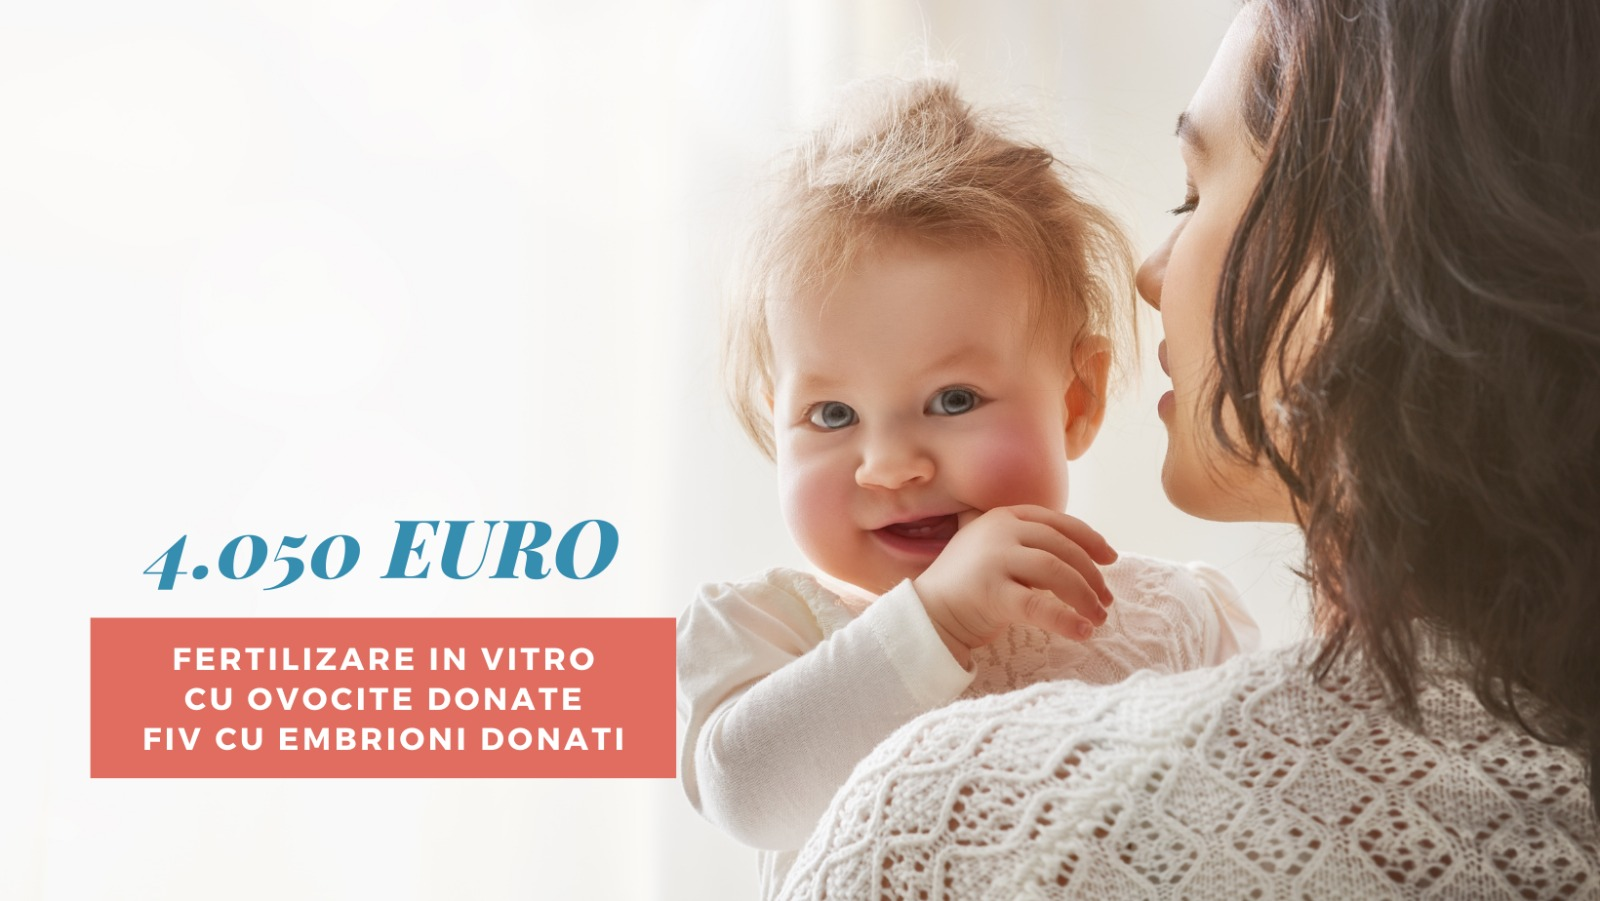 FIV cu ovocite donate 2021